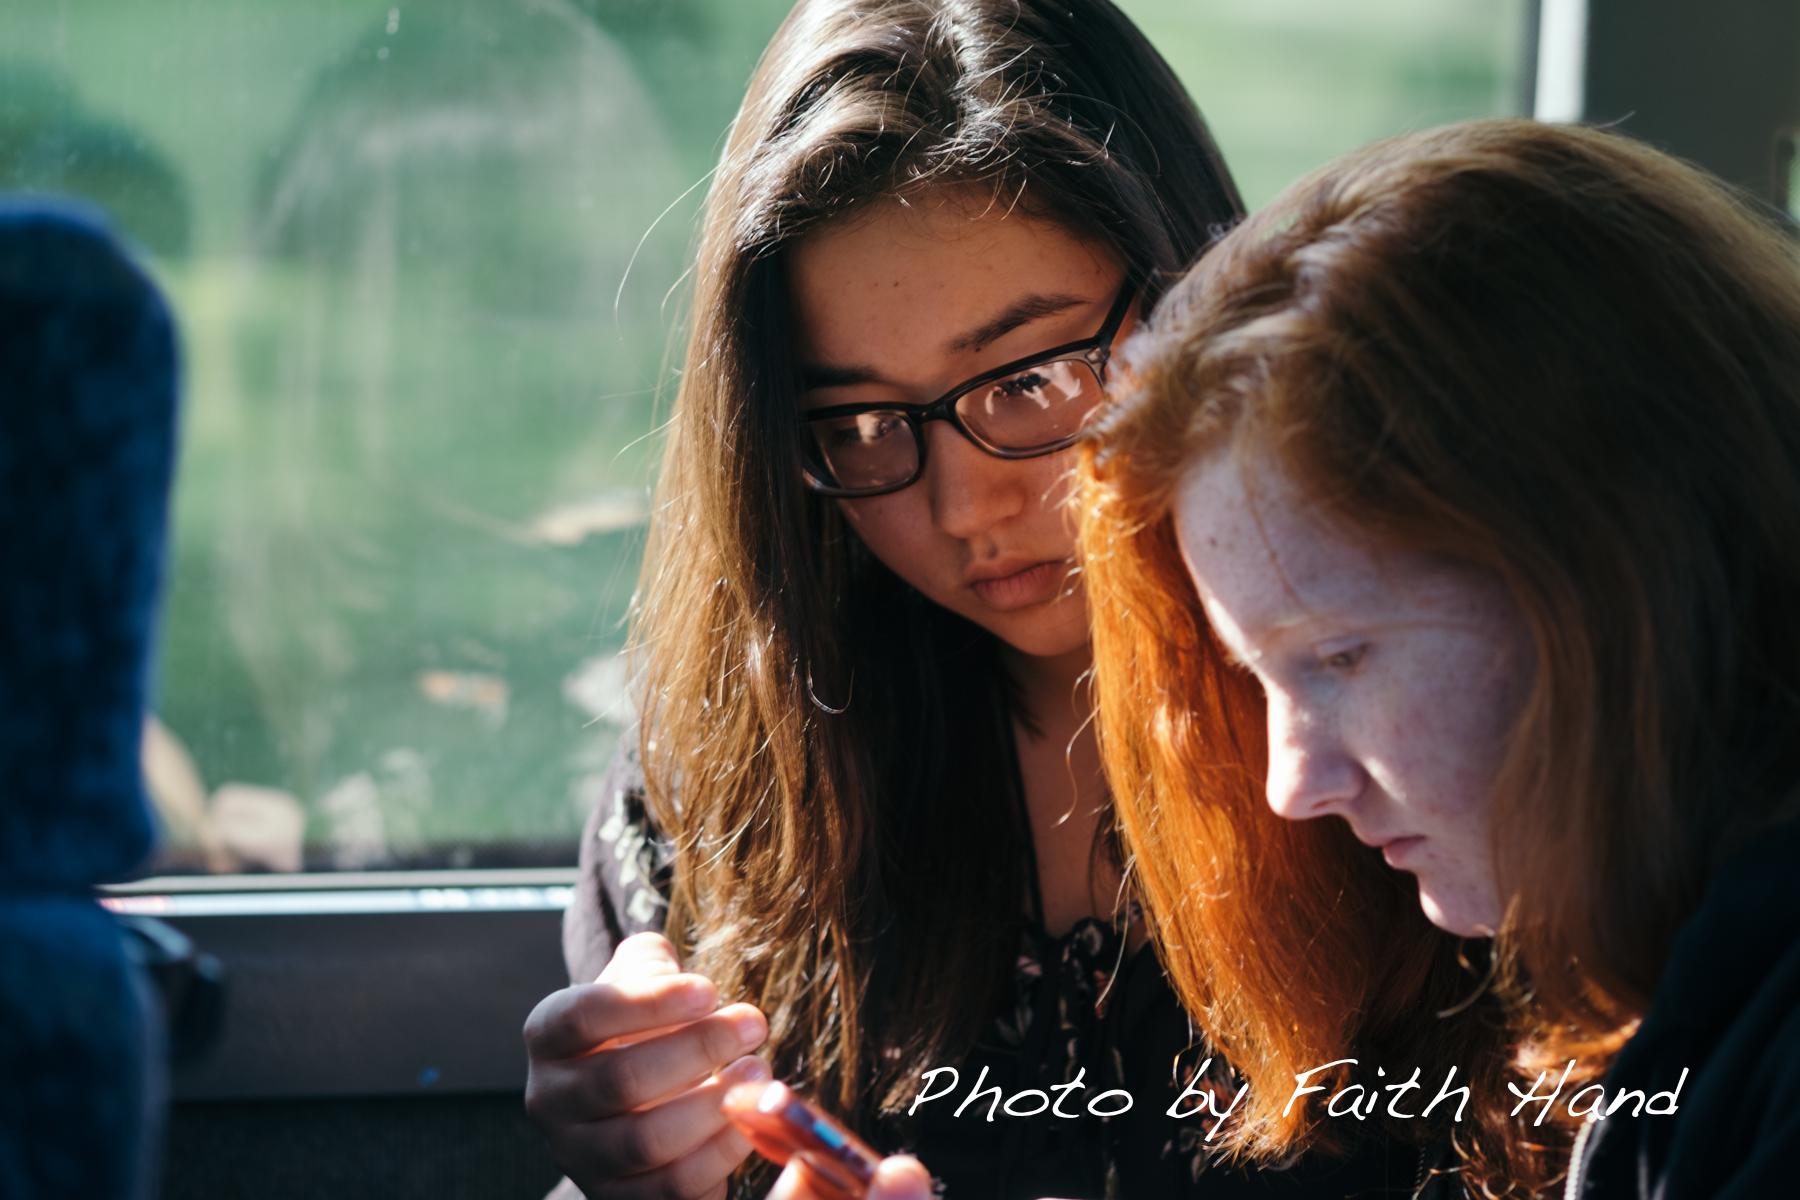 faith pic 6